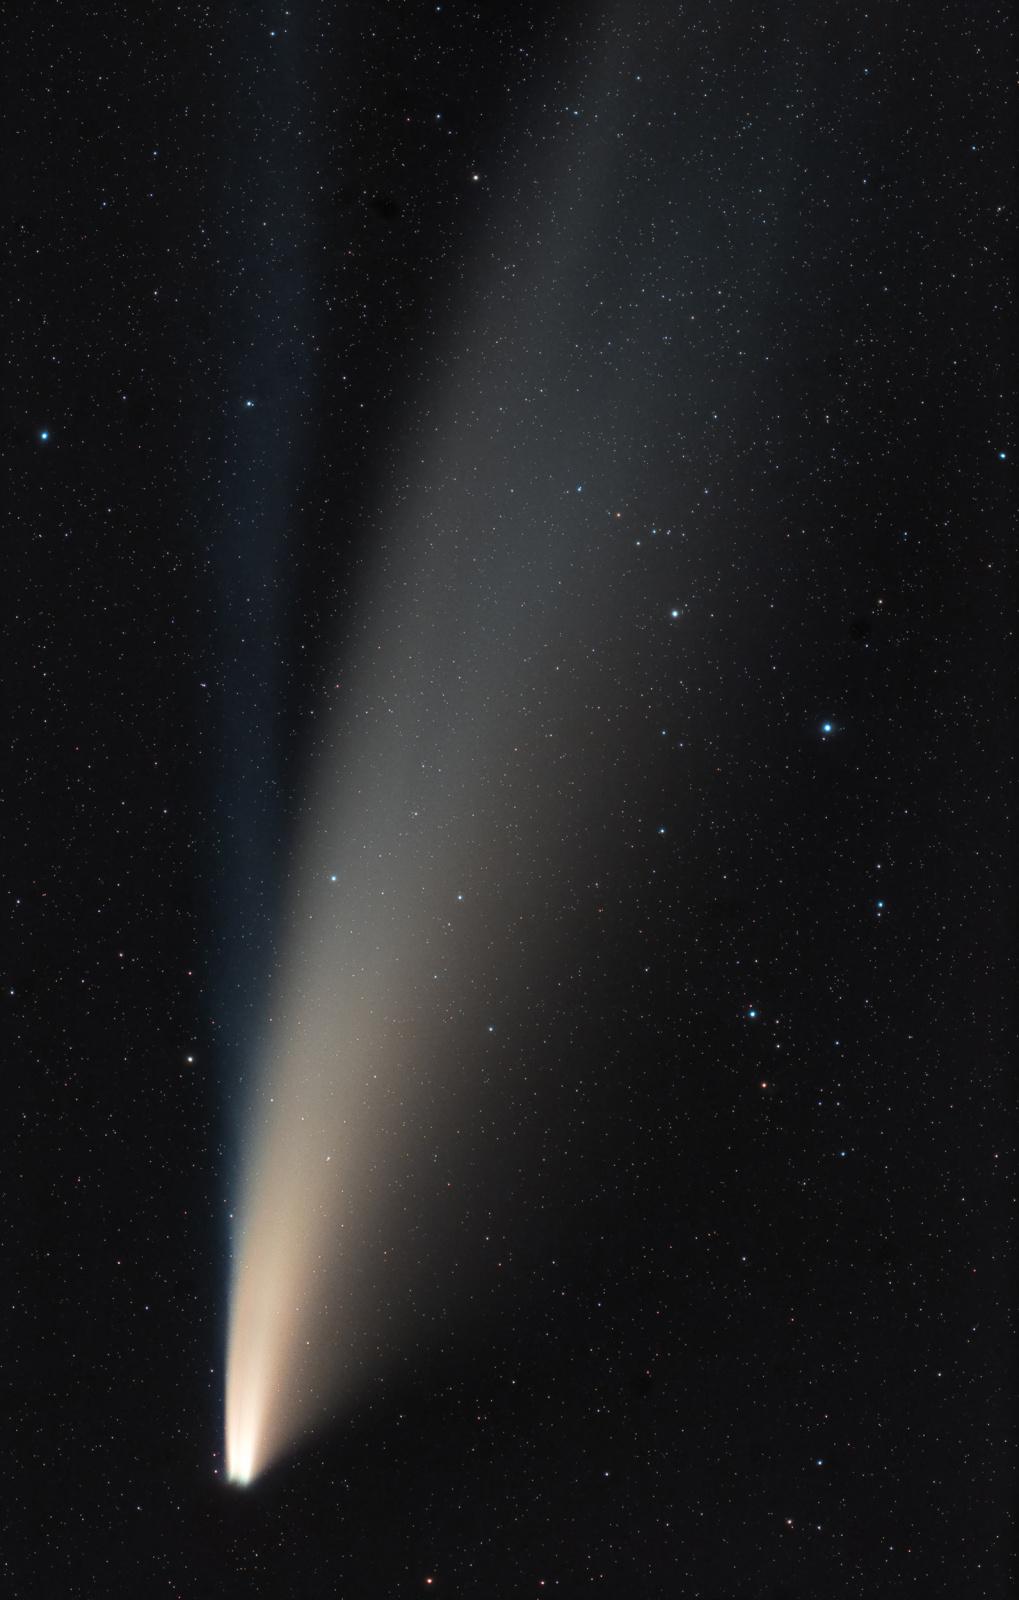 Kometa 15 fb.jpg